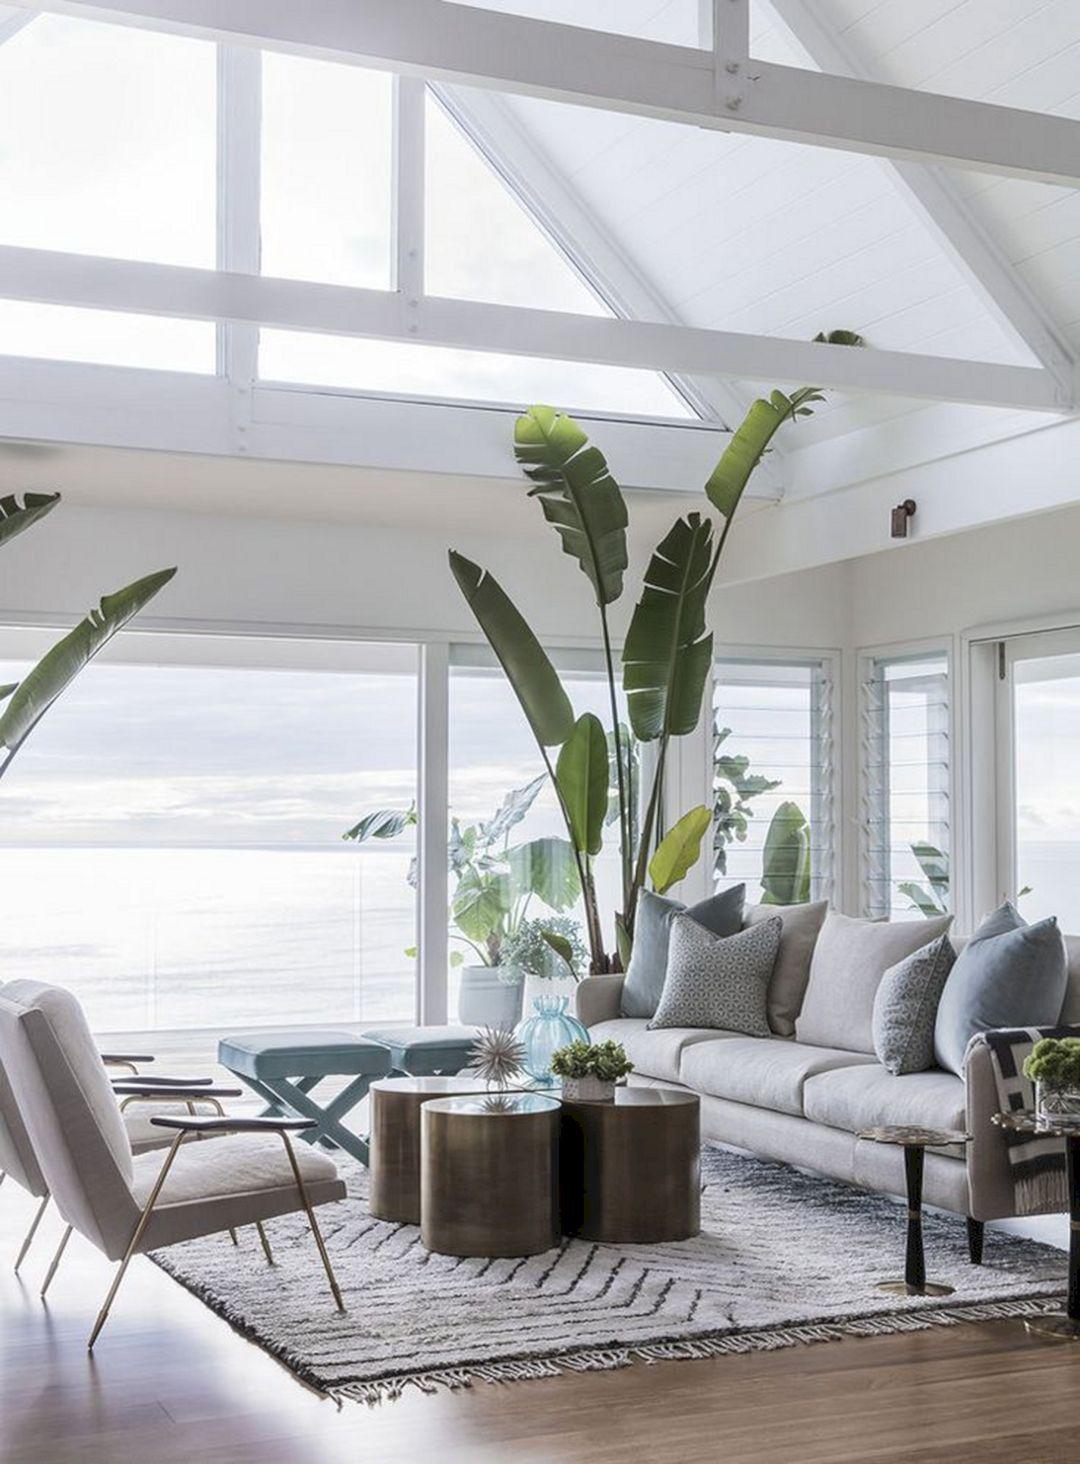 Photo of 18 Fabulous Beach Home Interior Design That Looks More Beautiful